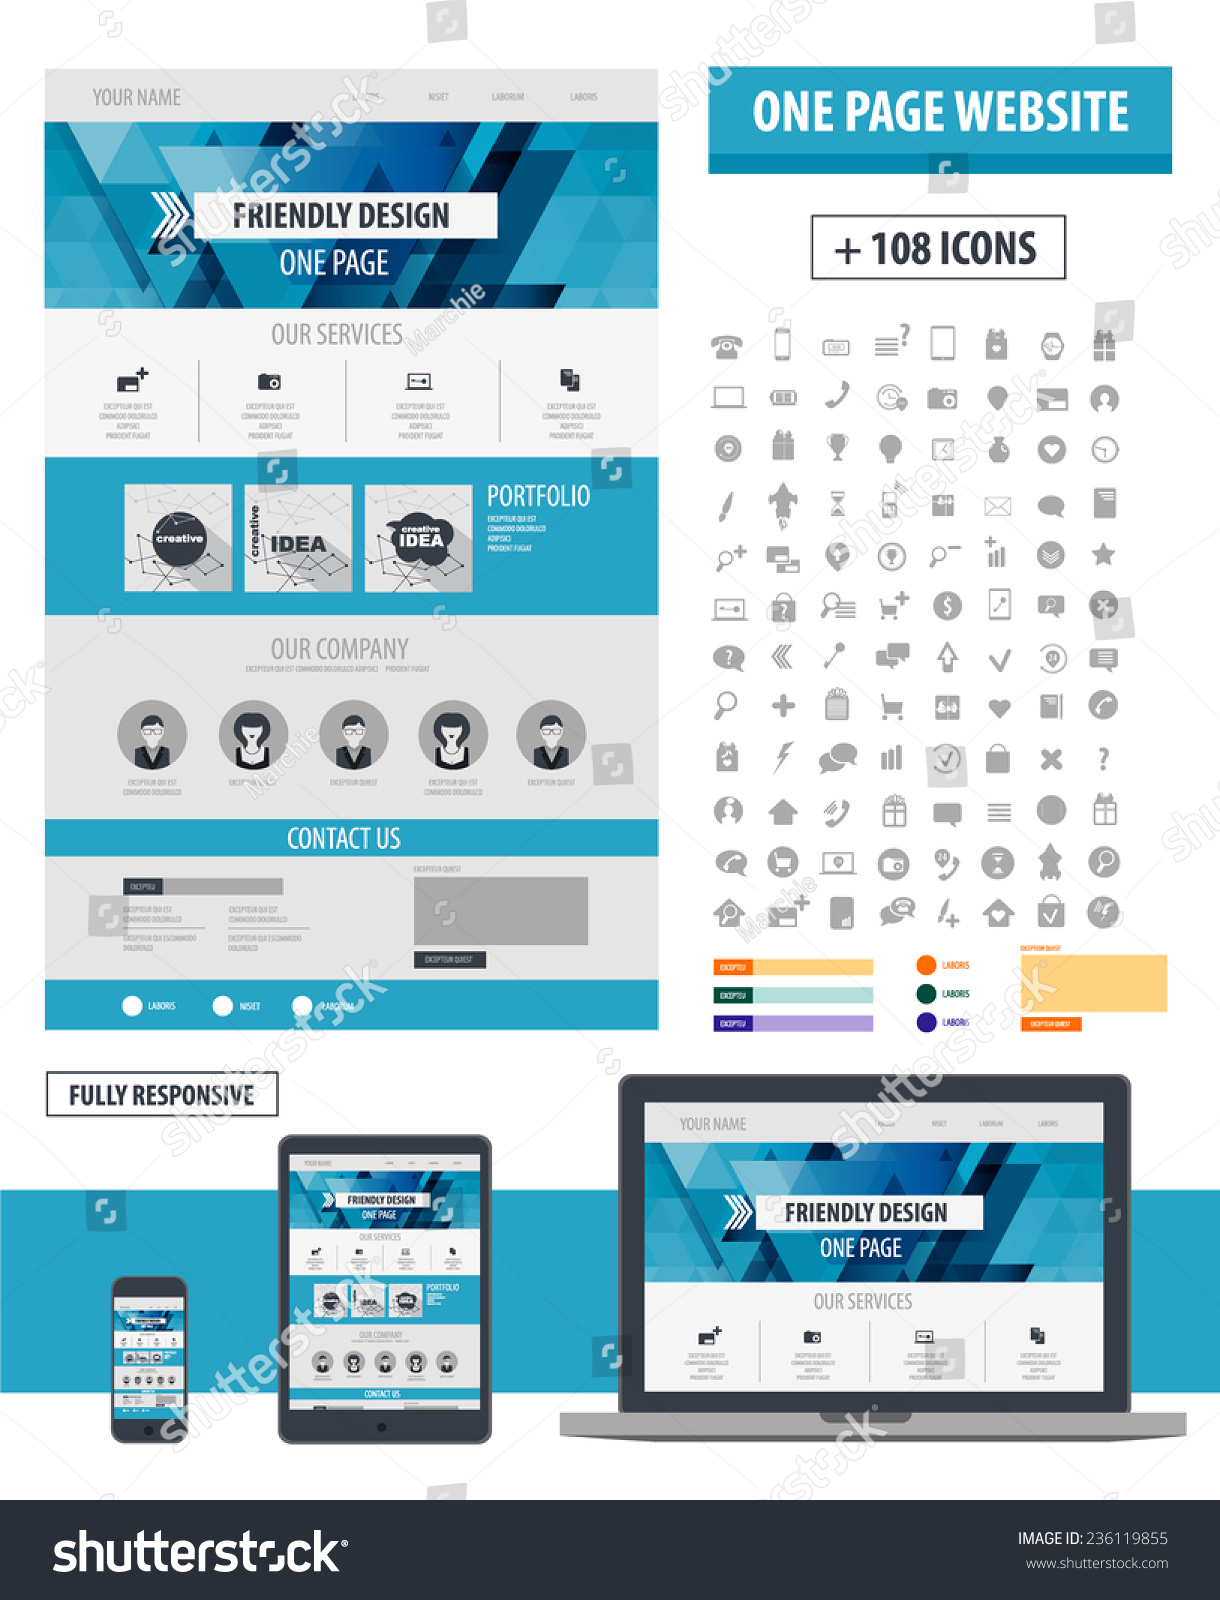 One Page Website Template Responsive Design Stock-Vektorgrafik ...